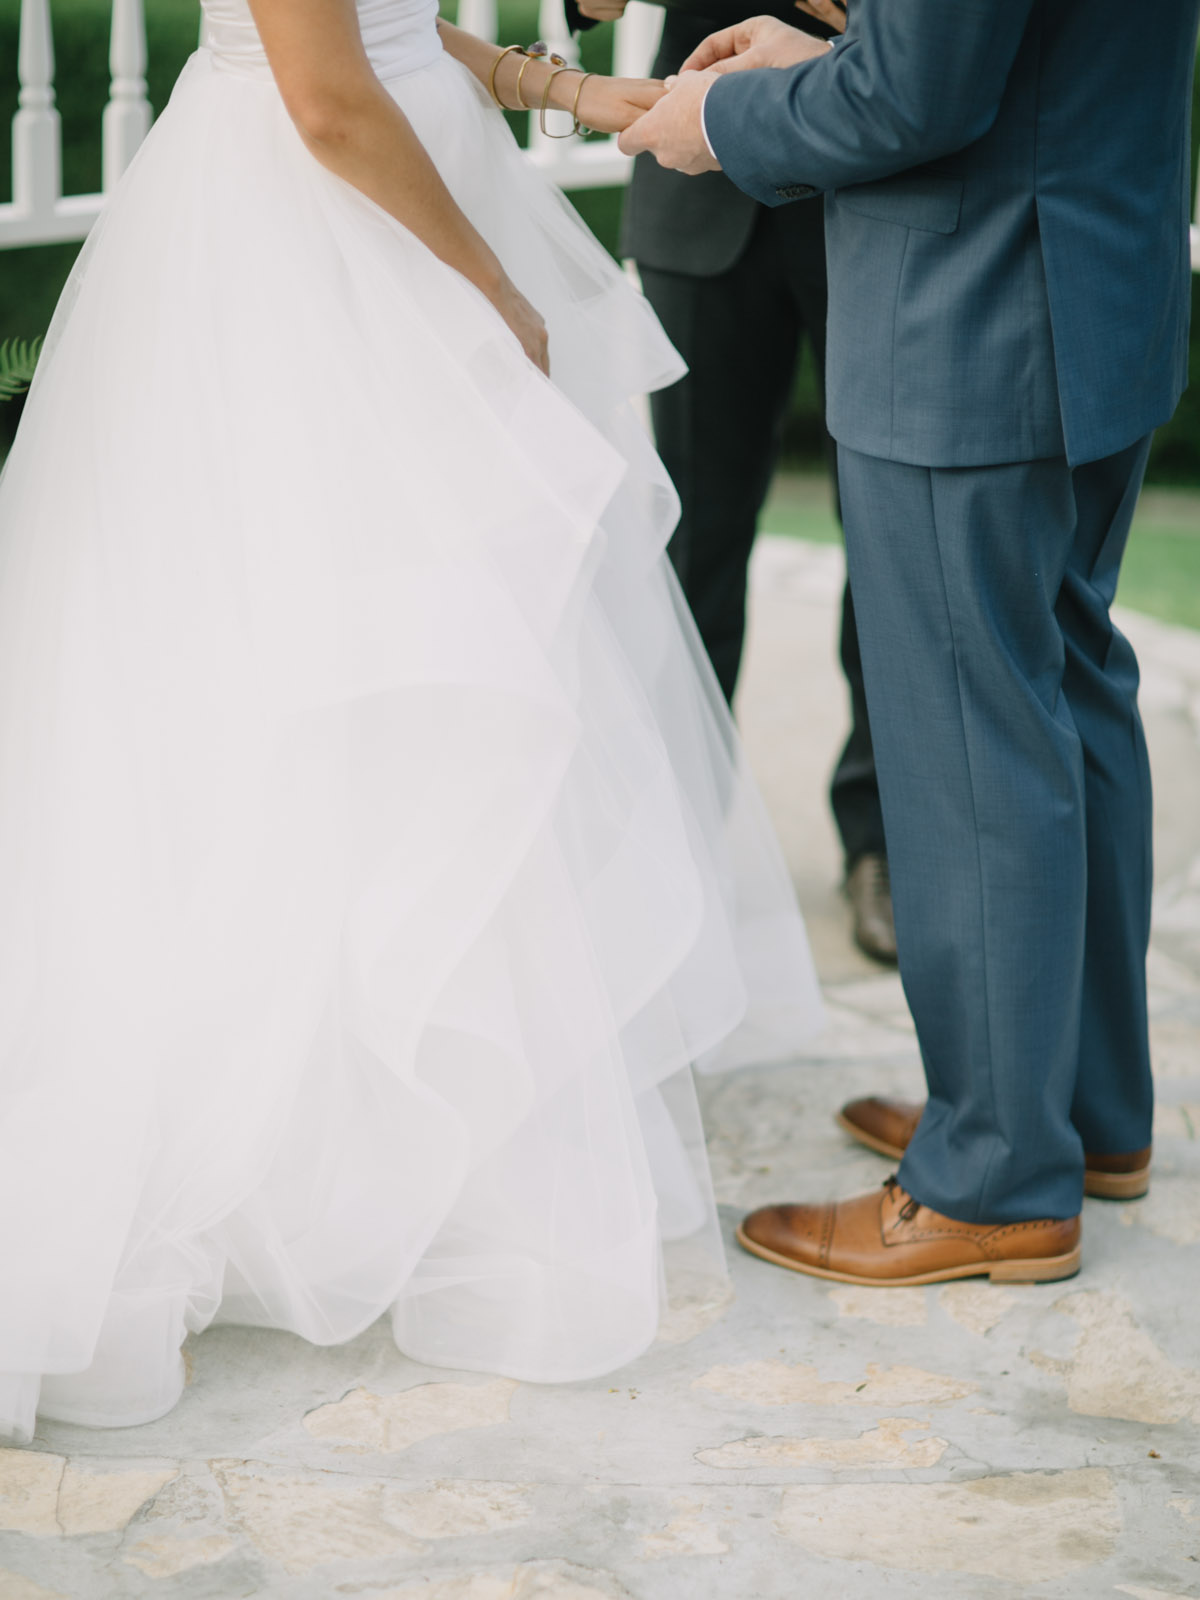 Palos Verdes Estates Wedding Photographer-014.jpg